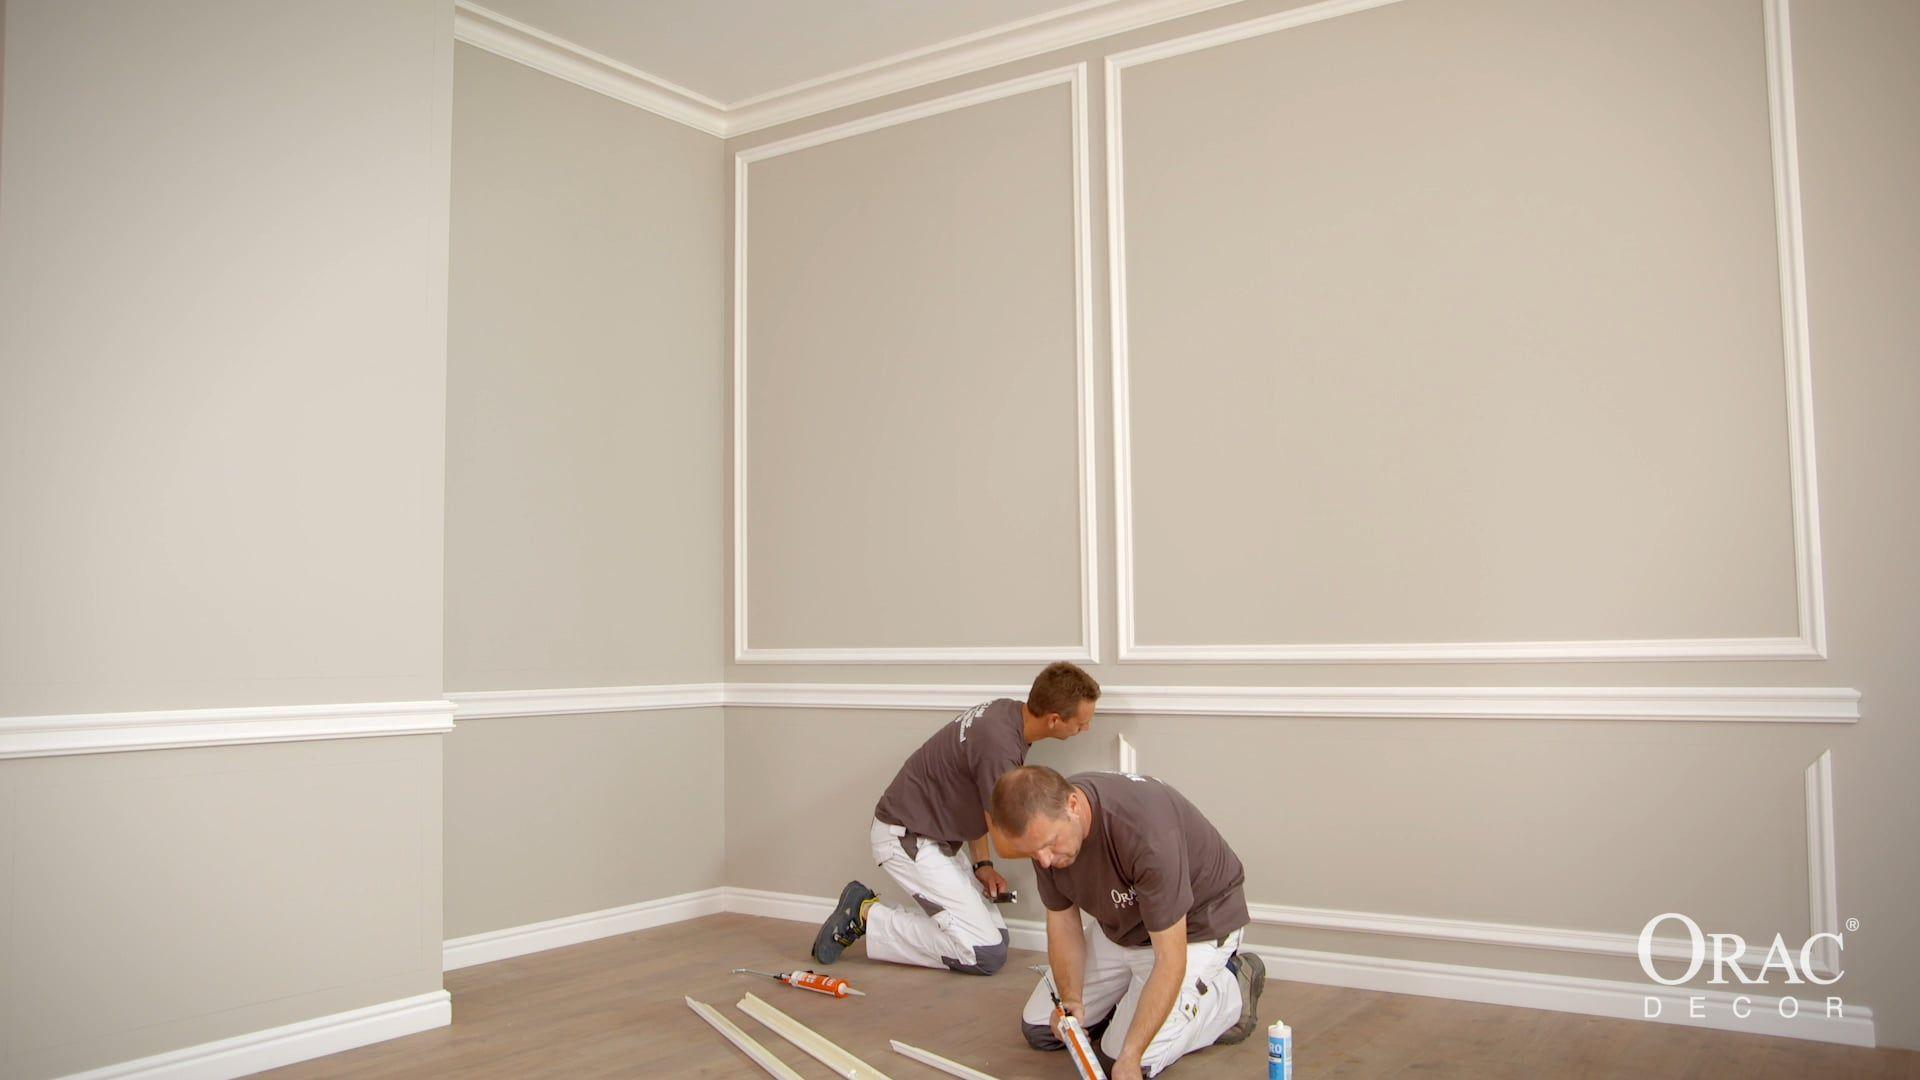 Orac Decor Installation Video Panel Mouldings B Orac Decor Wall Molding Moldings And Trim